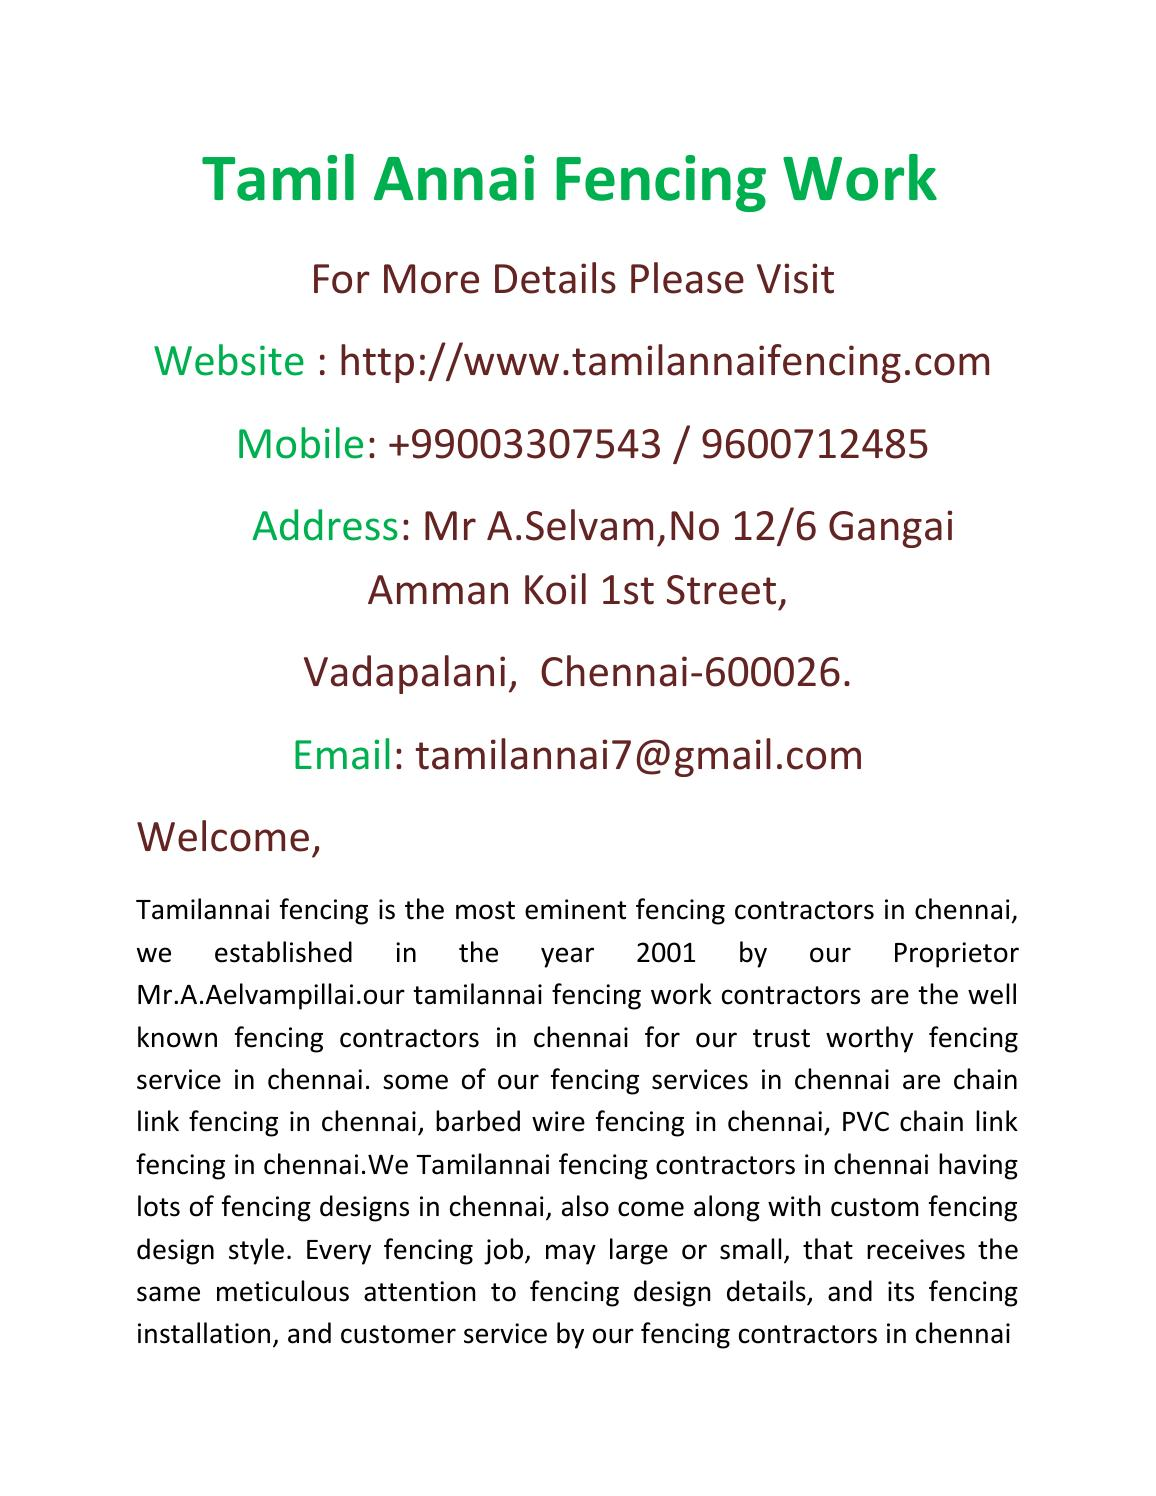 Chain link fencing in chennai by selvam tamilannai issuu